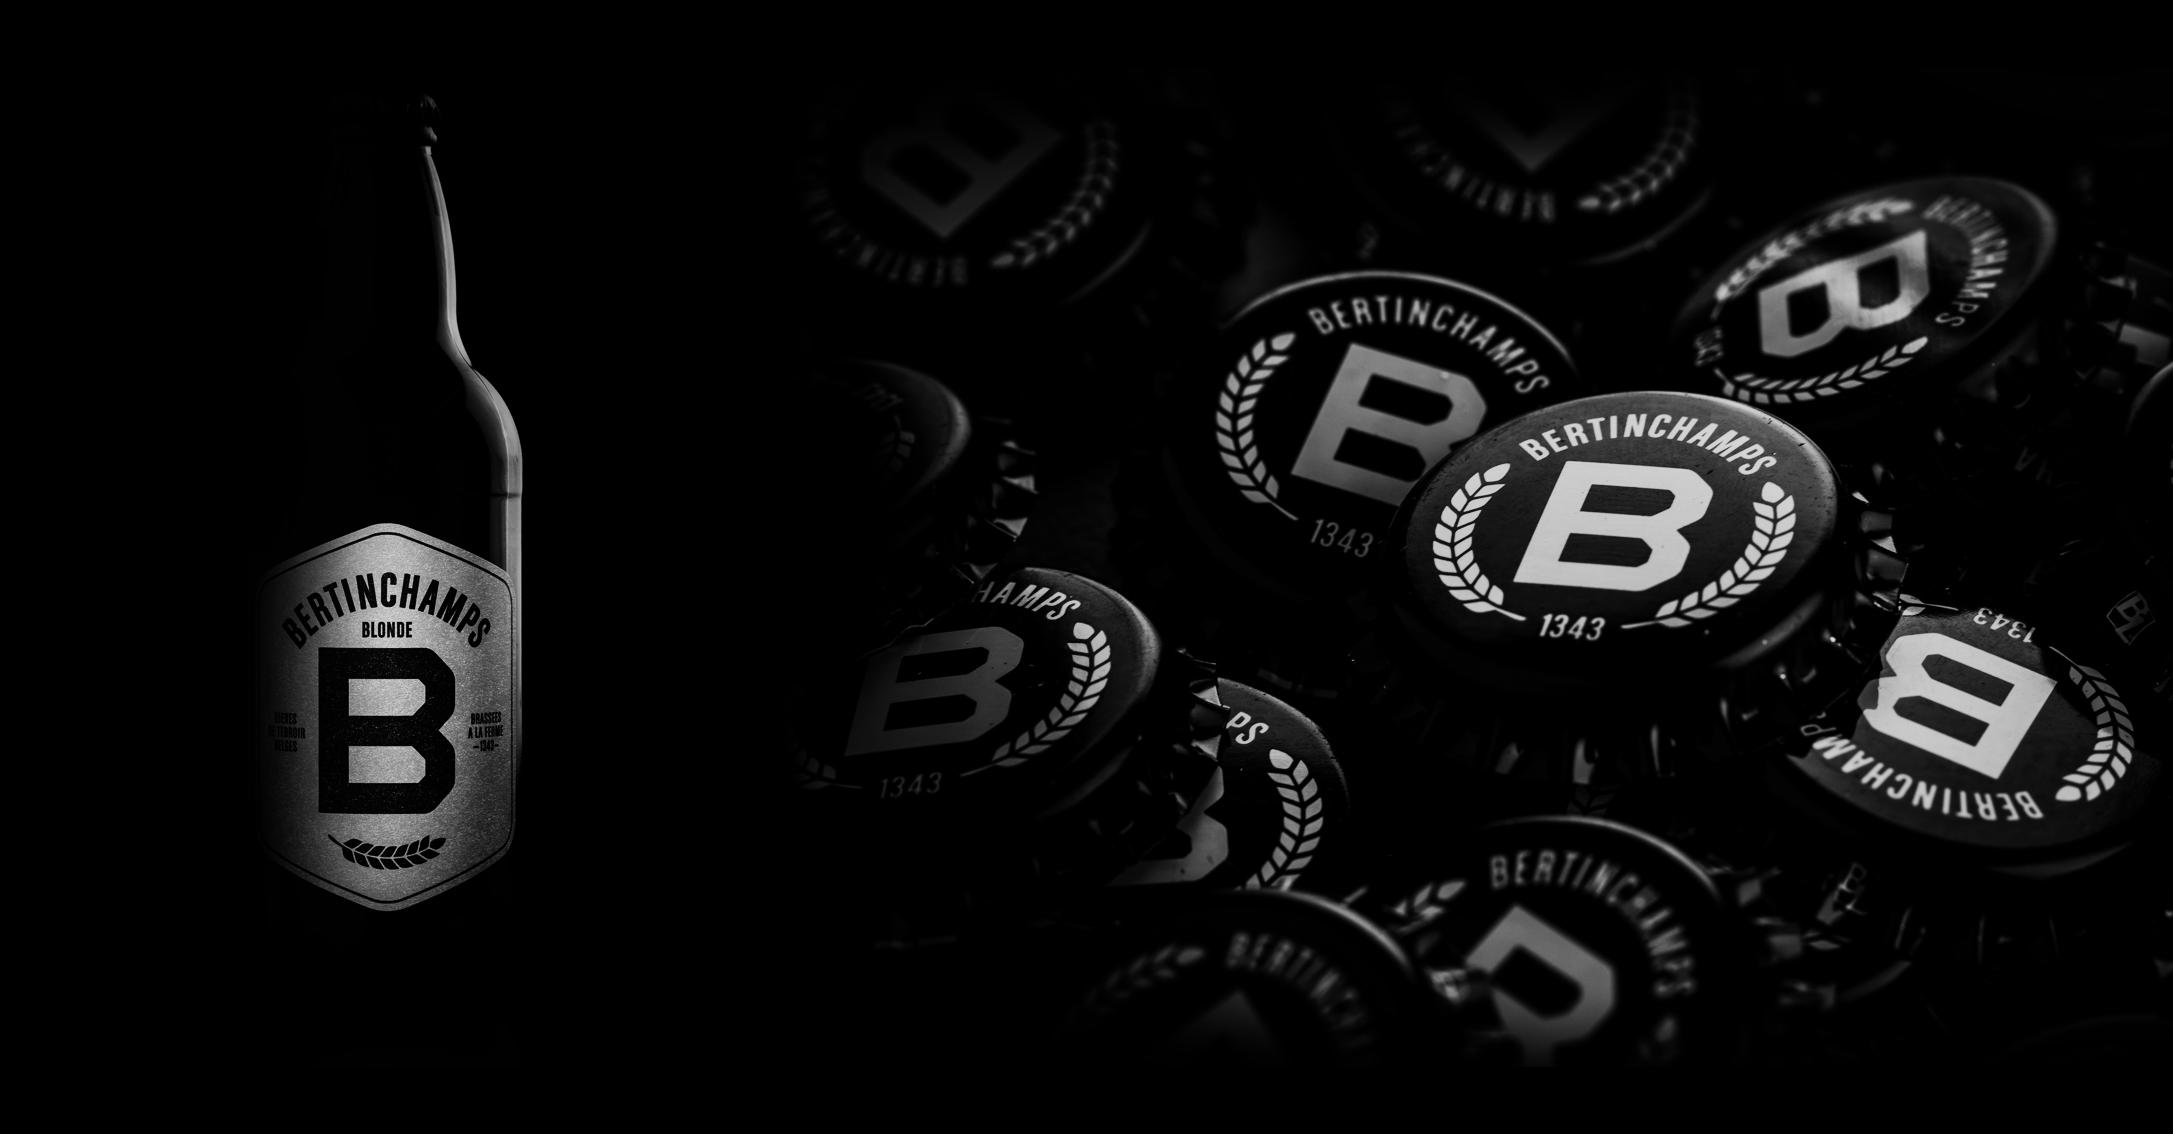 Beer brand Bertinchamps  Client: Axford Tjon